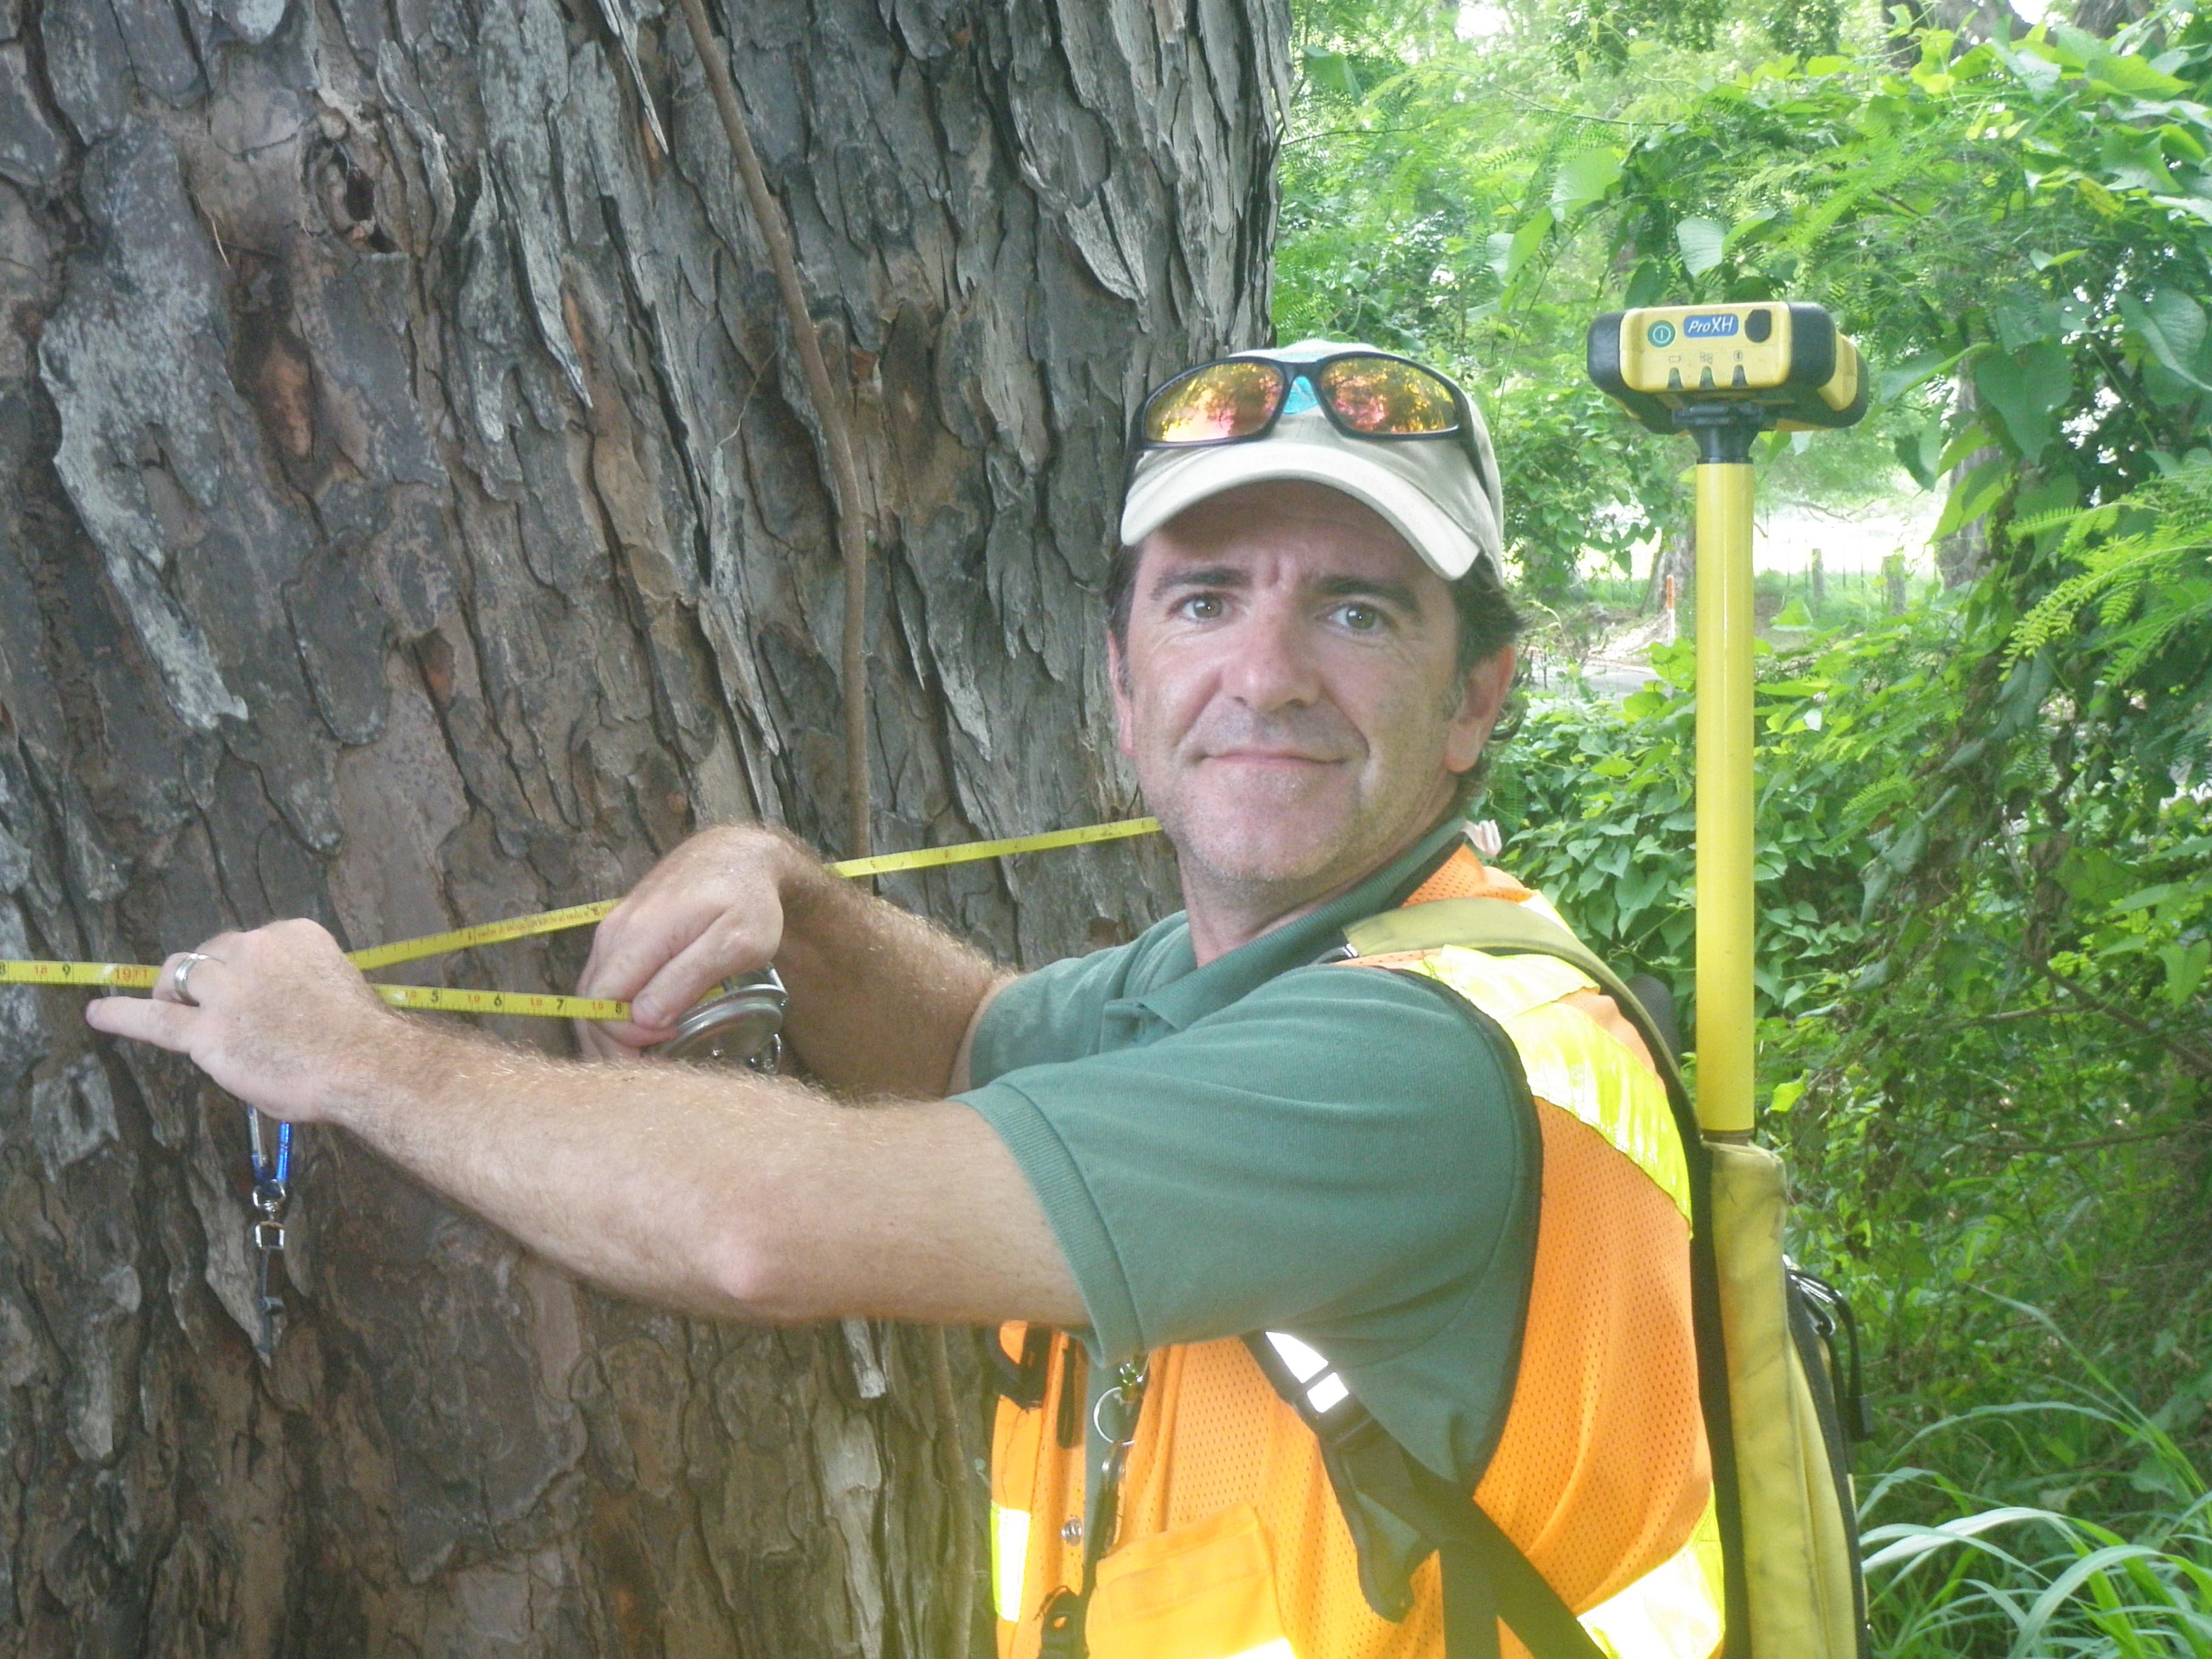 Brian moseley virgin island surveyor